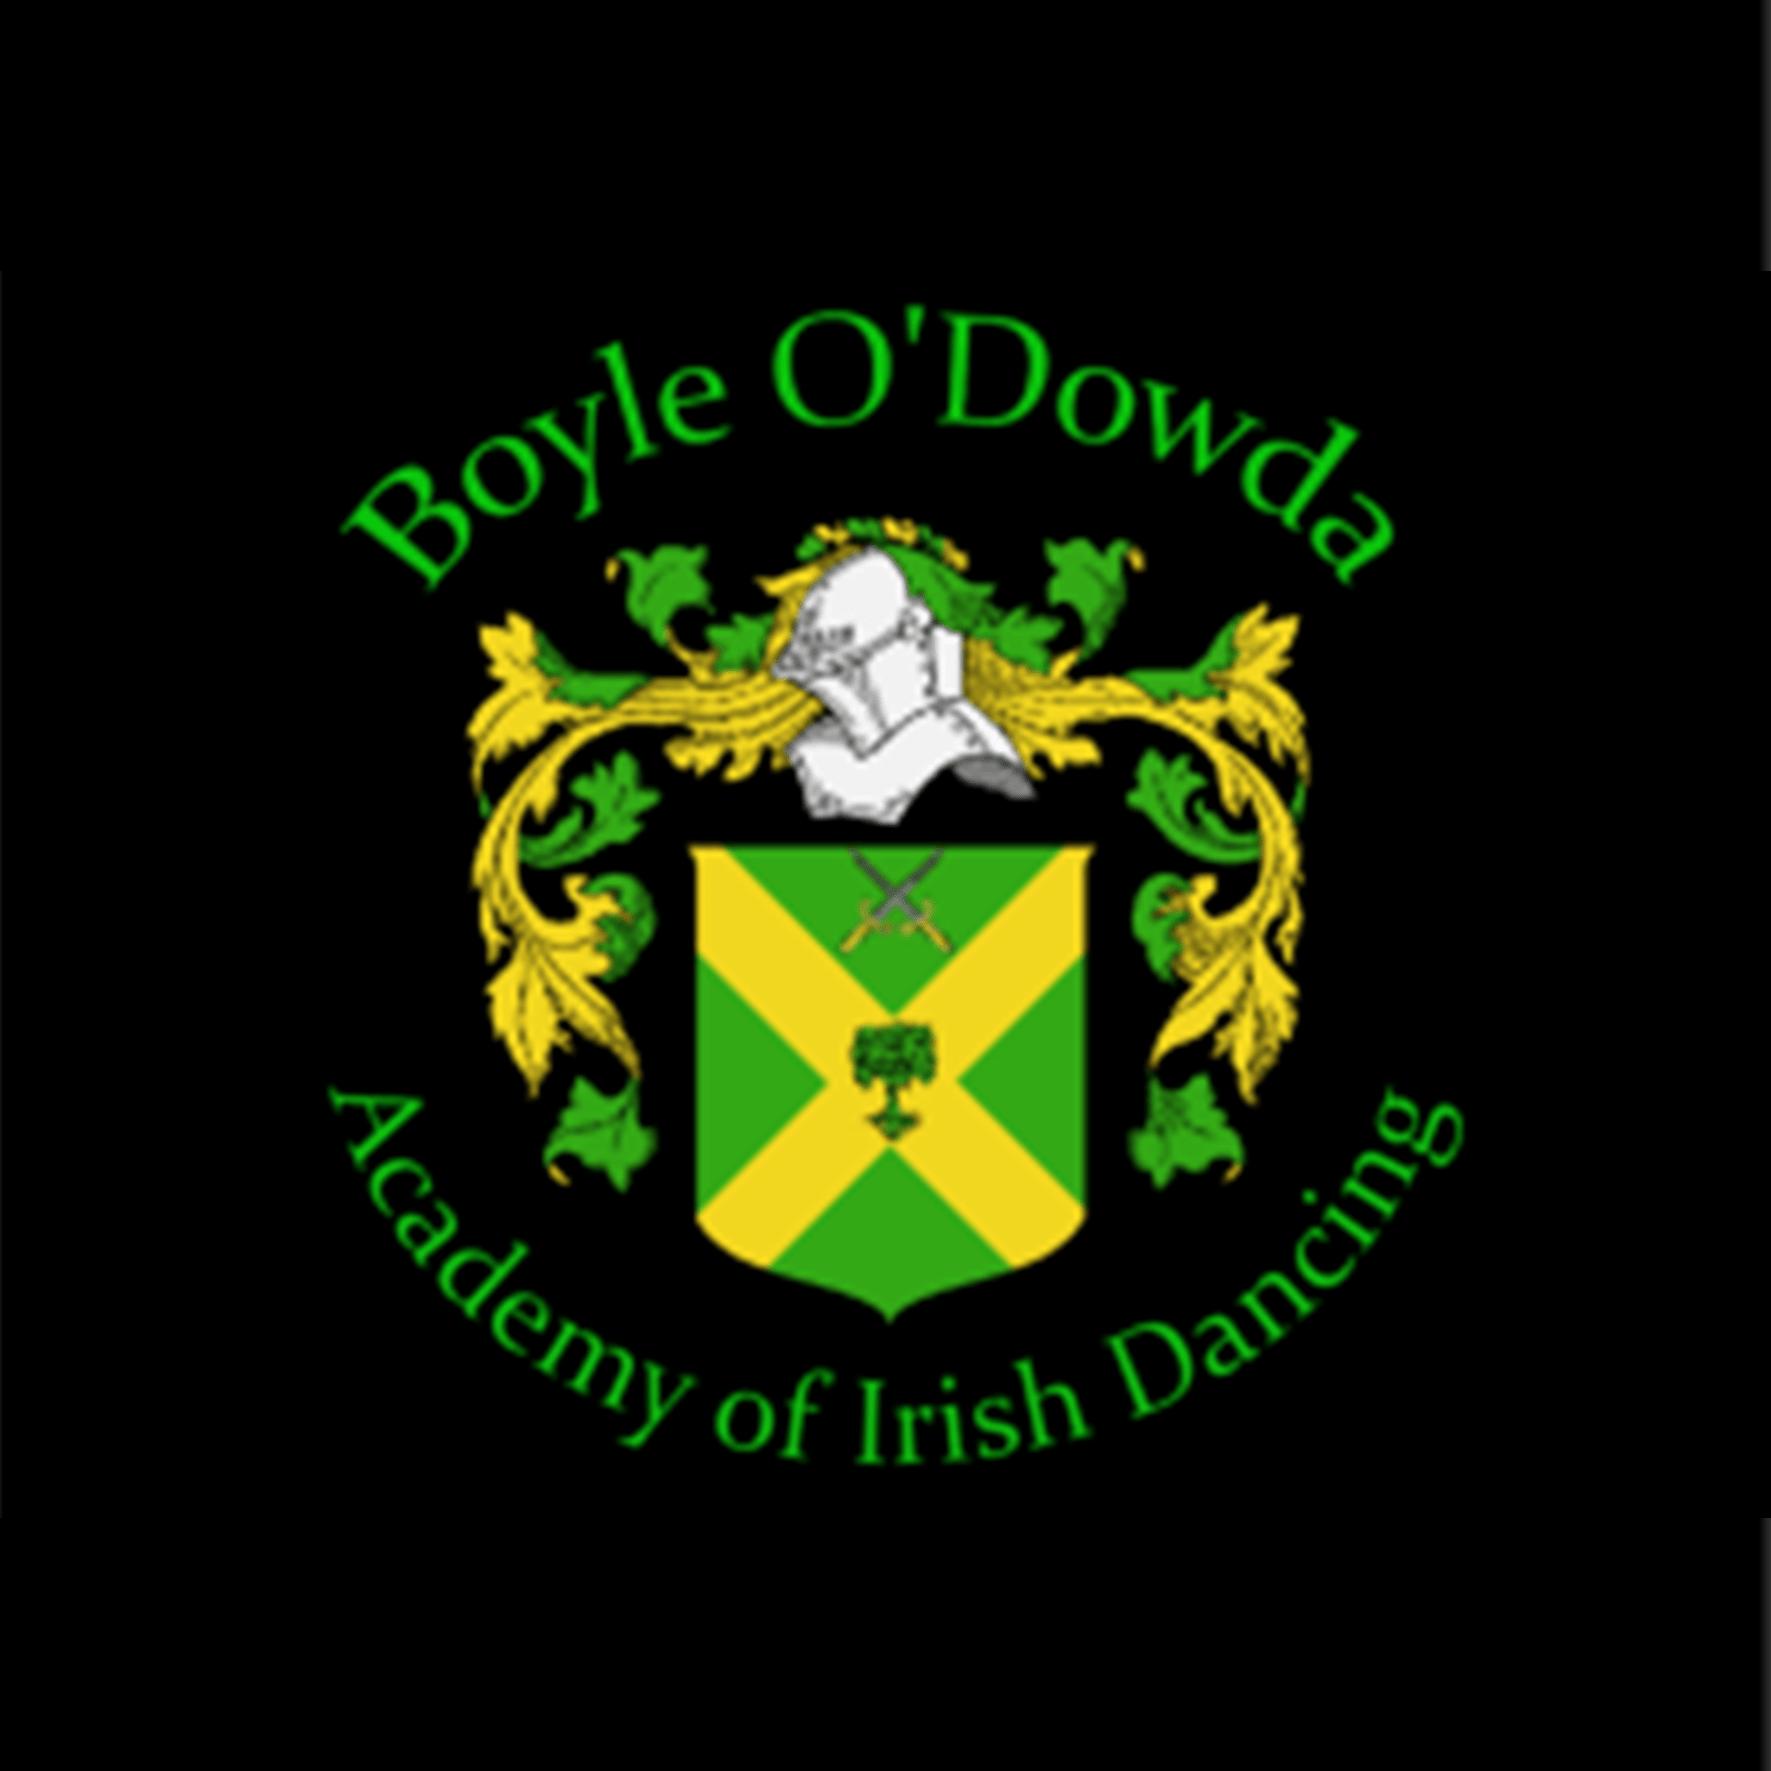 Boyle O'Dowda Academy of Irish Dancing